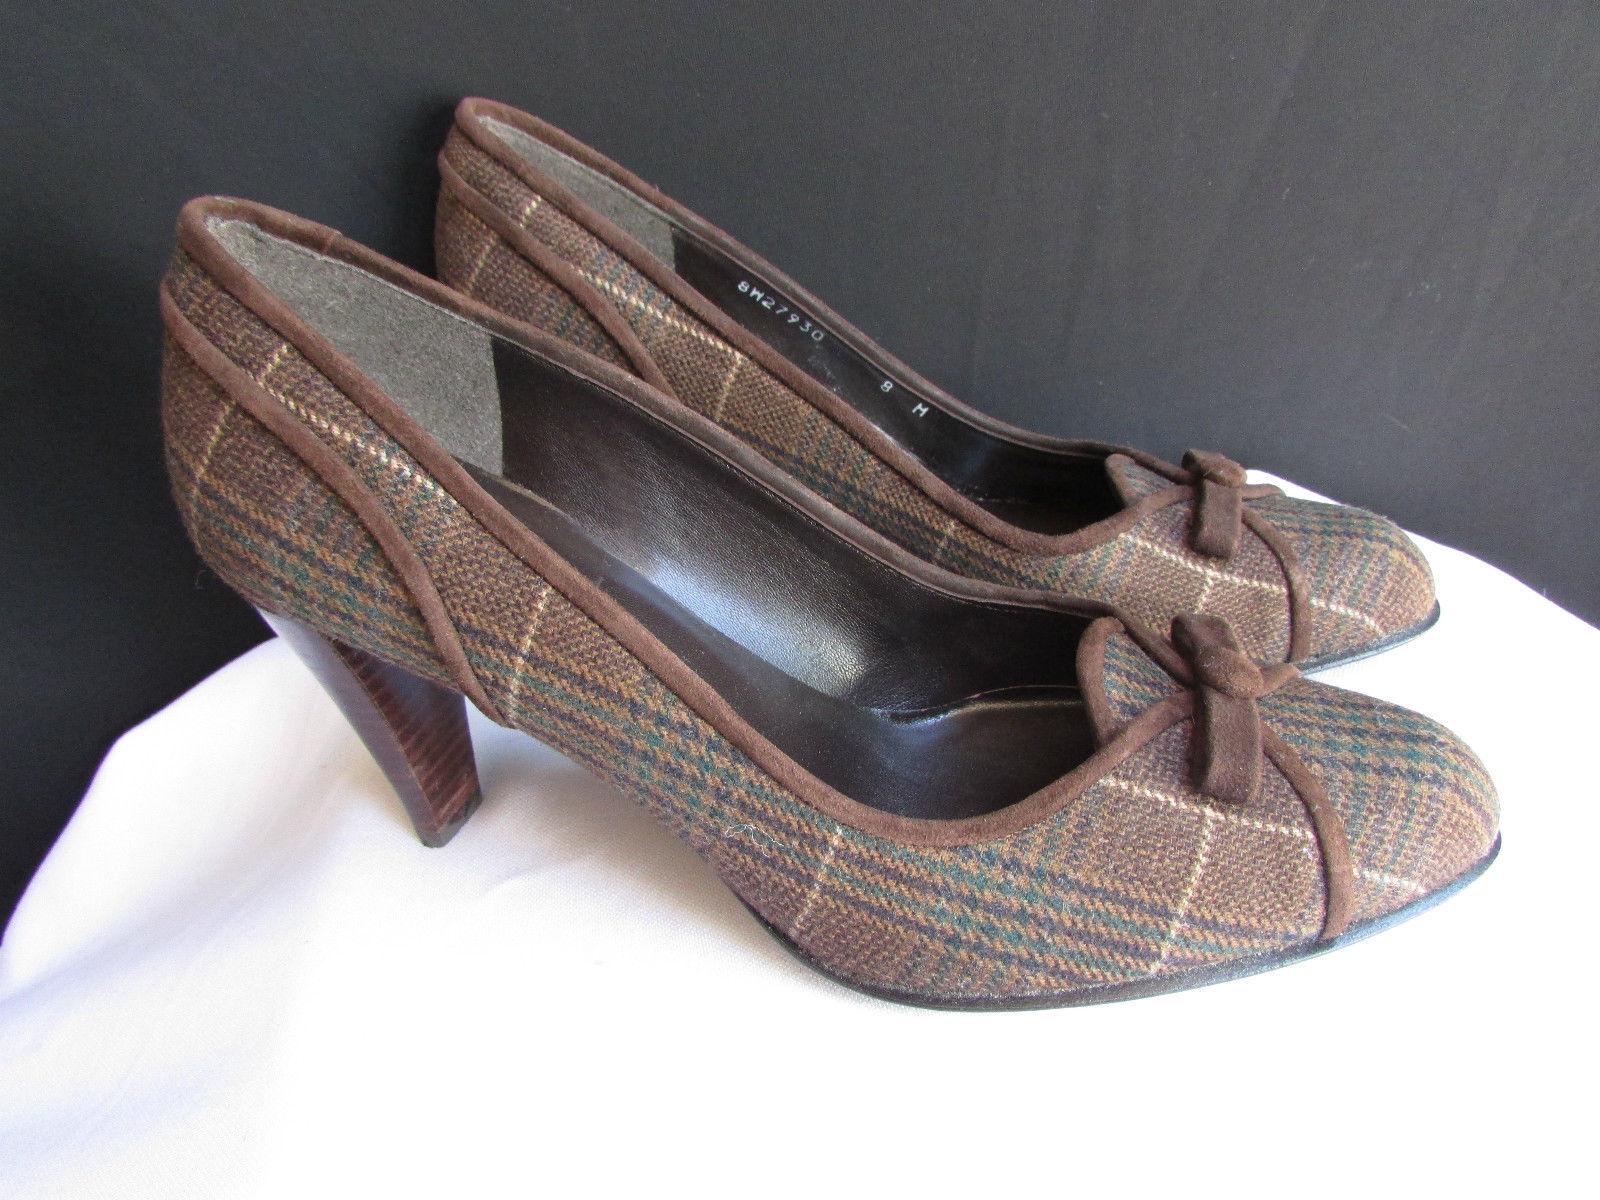 Stuart Weitzman damen Dark braun Plaids Dressy Bow Pump Mid High Heels schuhe 8.5